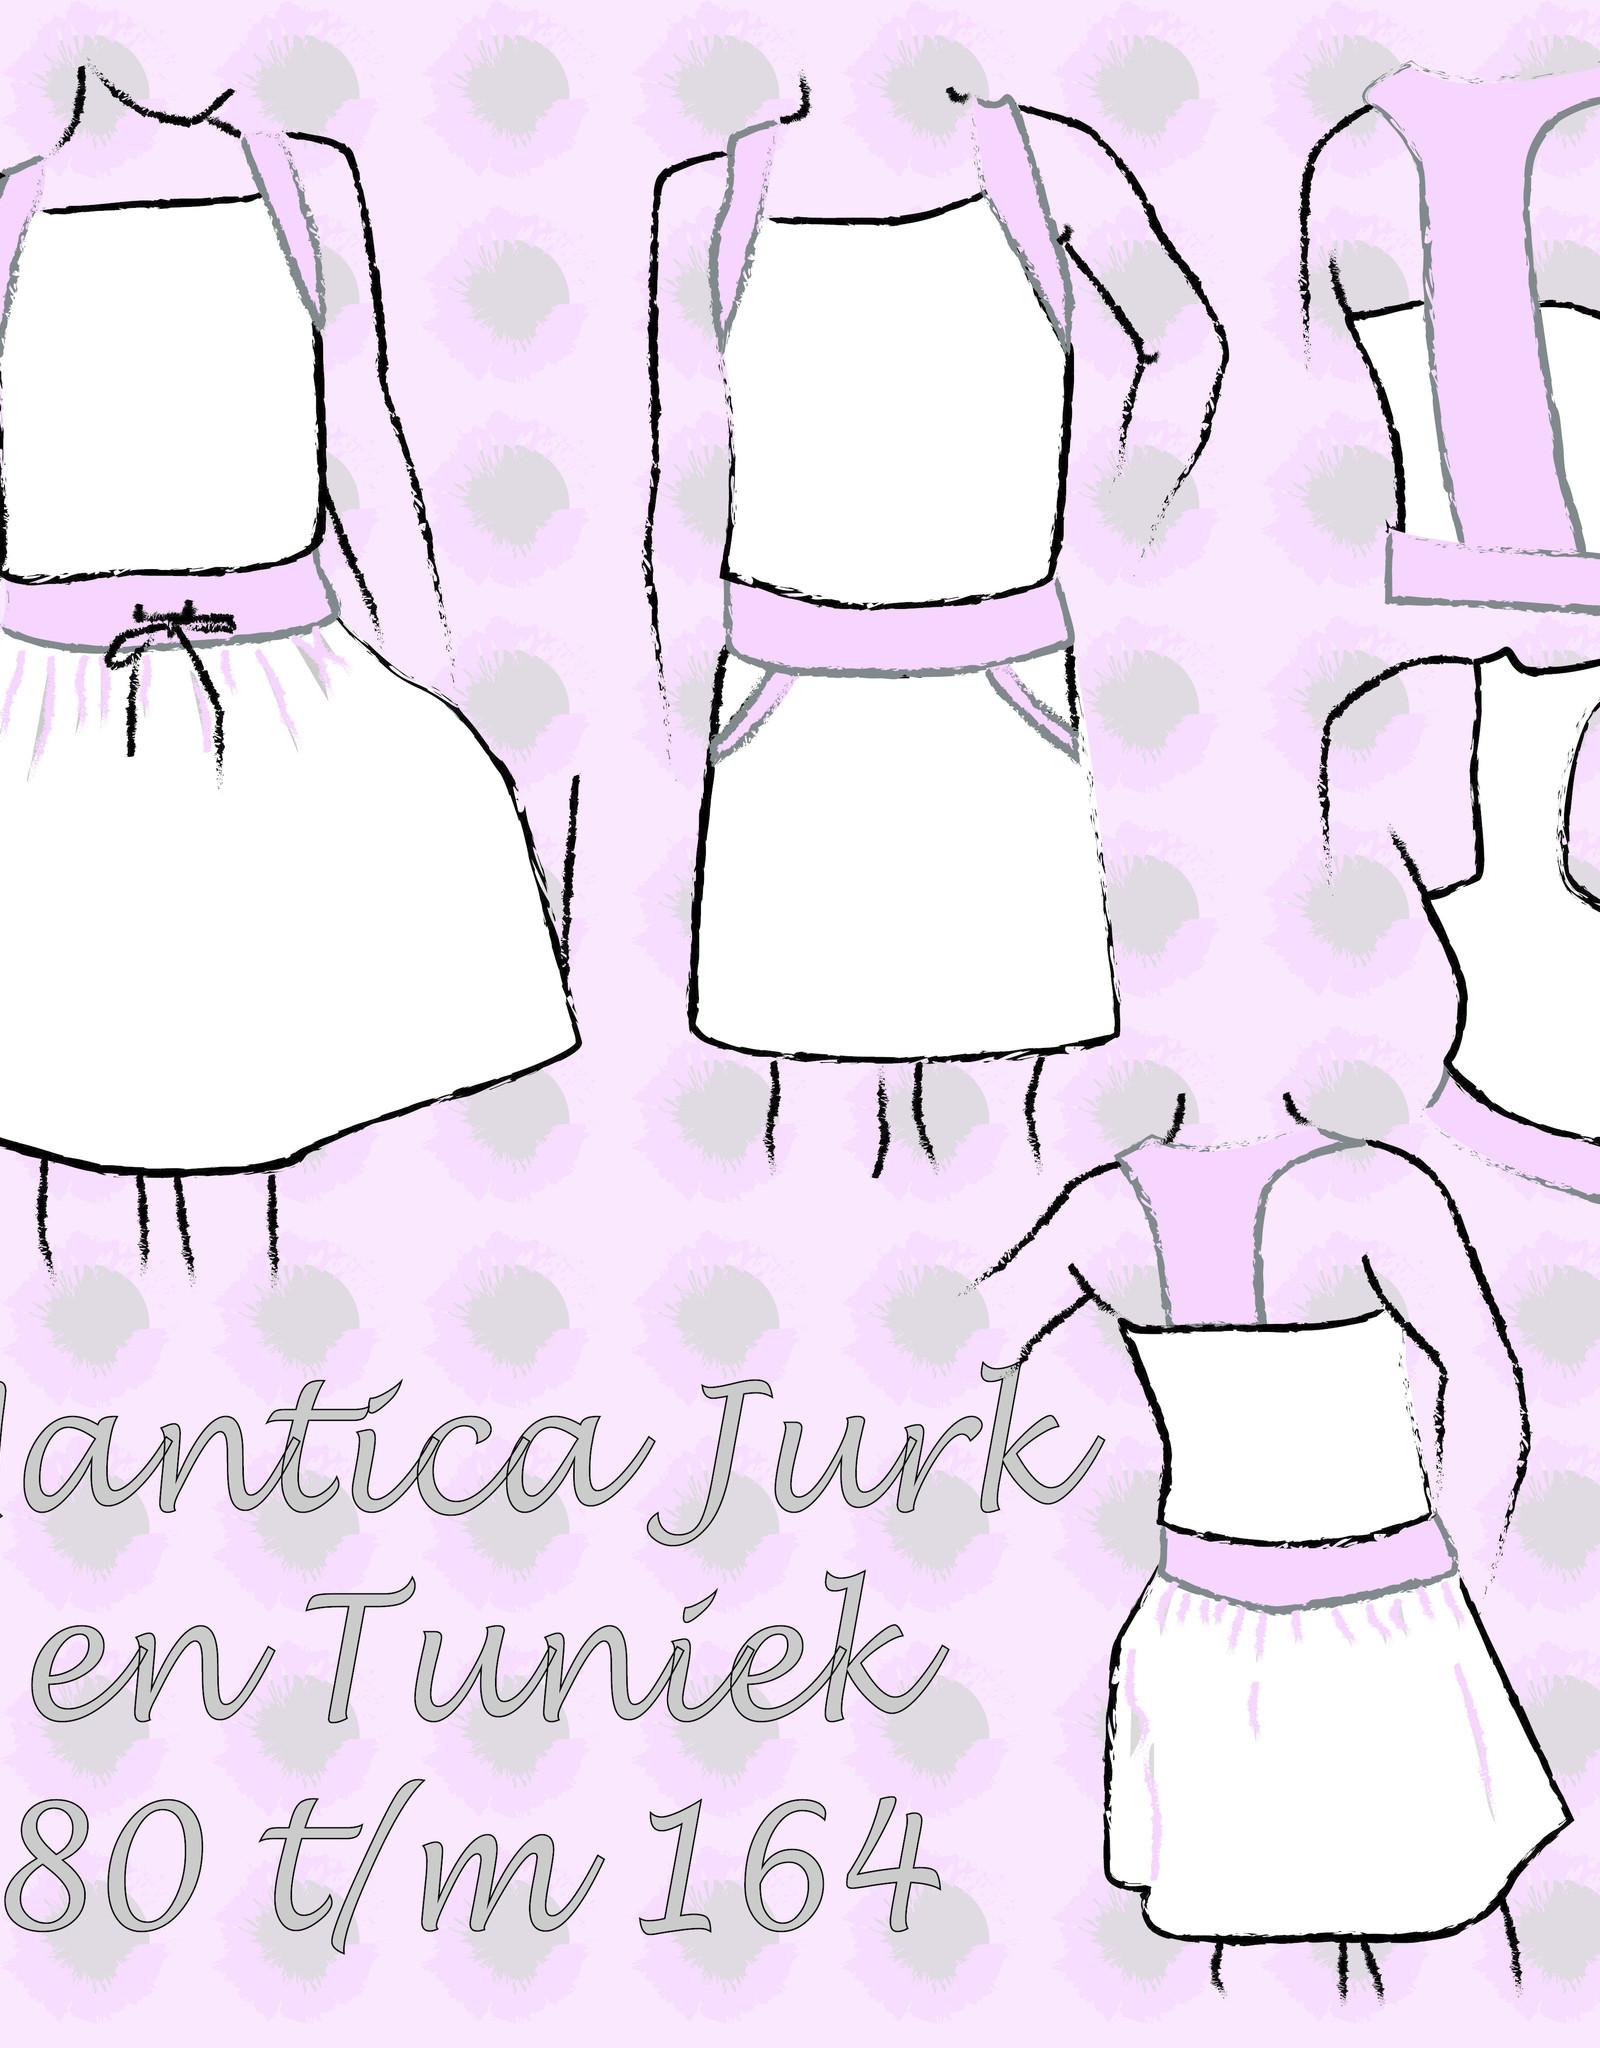 Sofilantjes Mantica jurk en tuniek - Sofilantjes